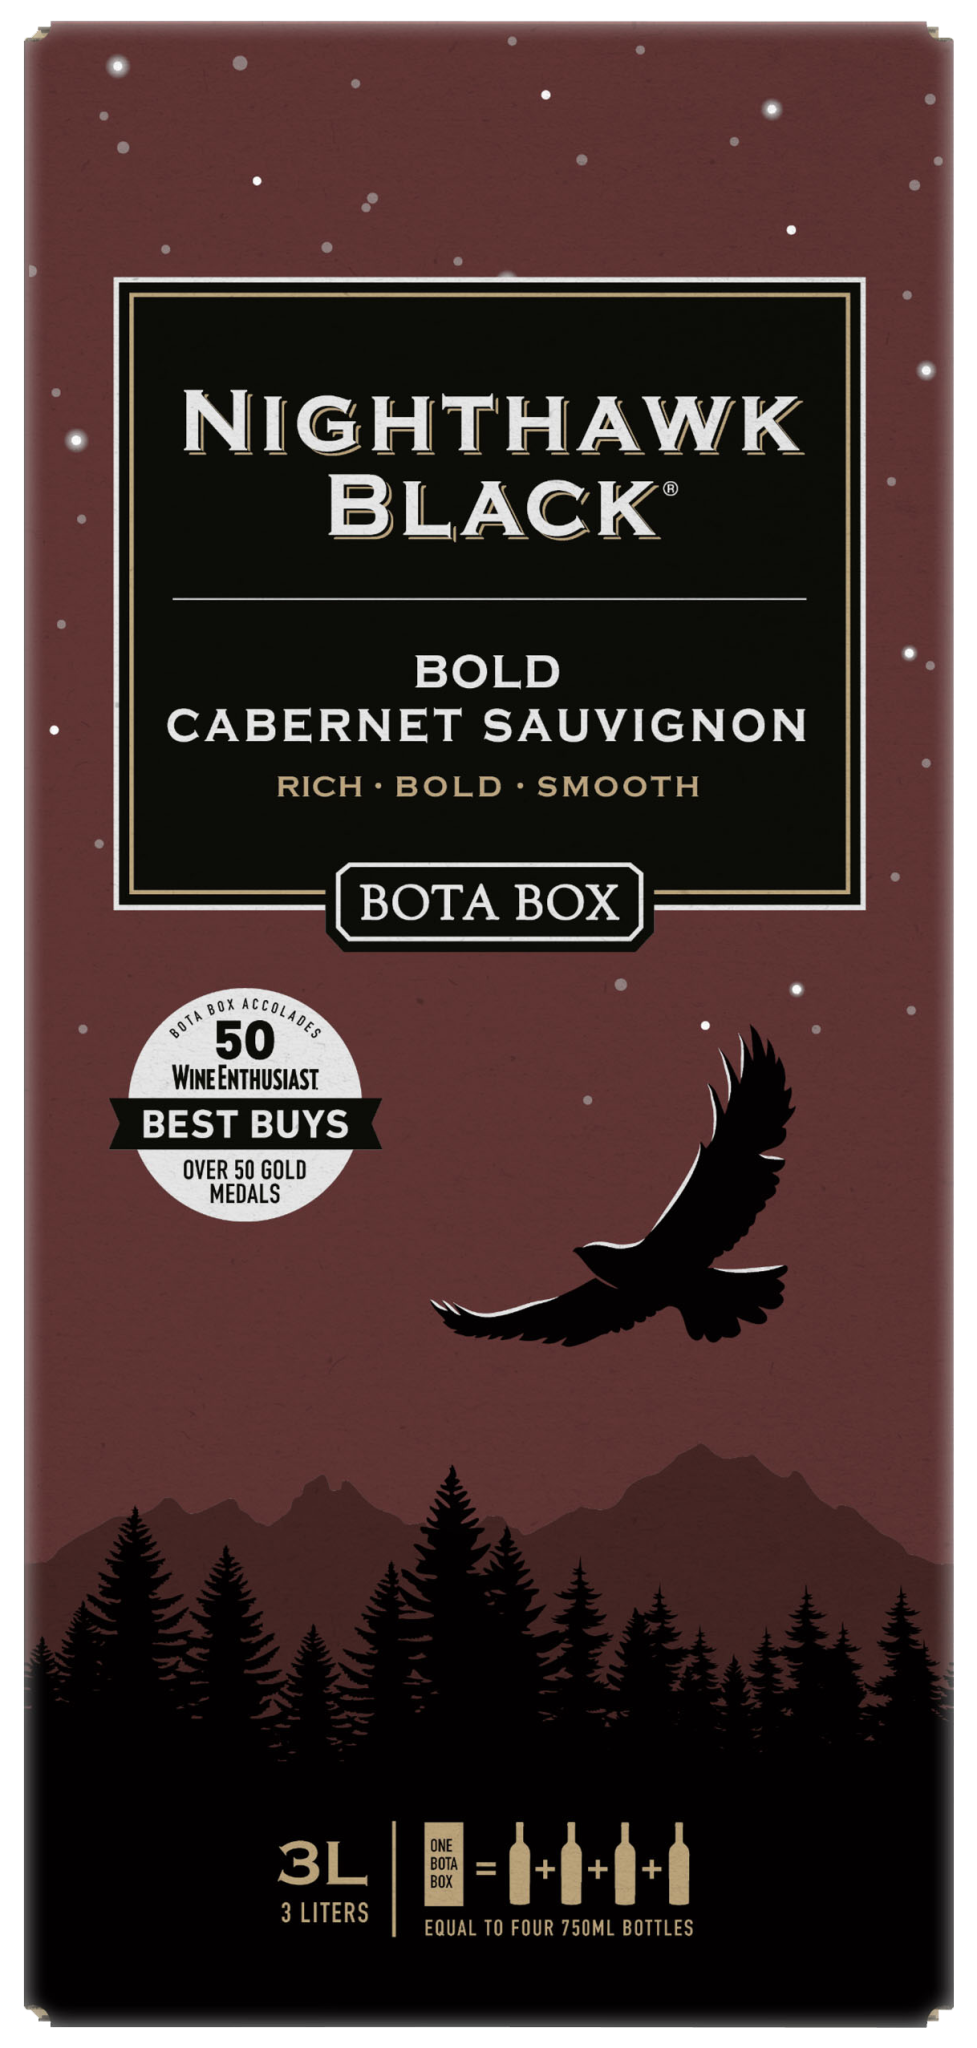 BOTA BOX NIGHTHAWK CABERNET SAUVIGNON 3 LITER BOX